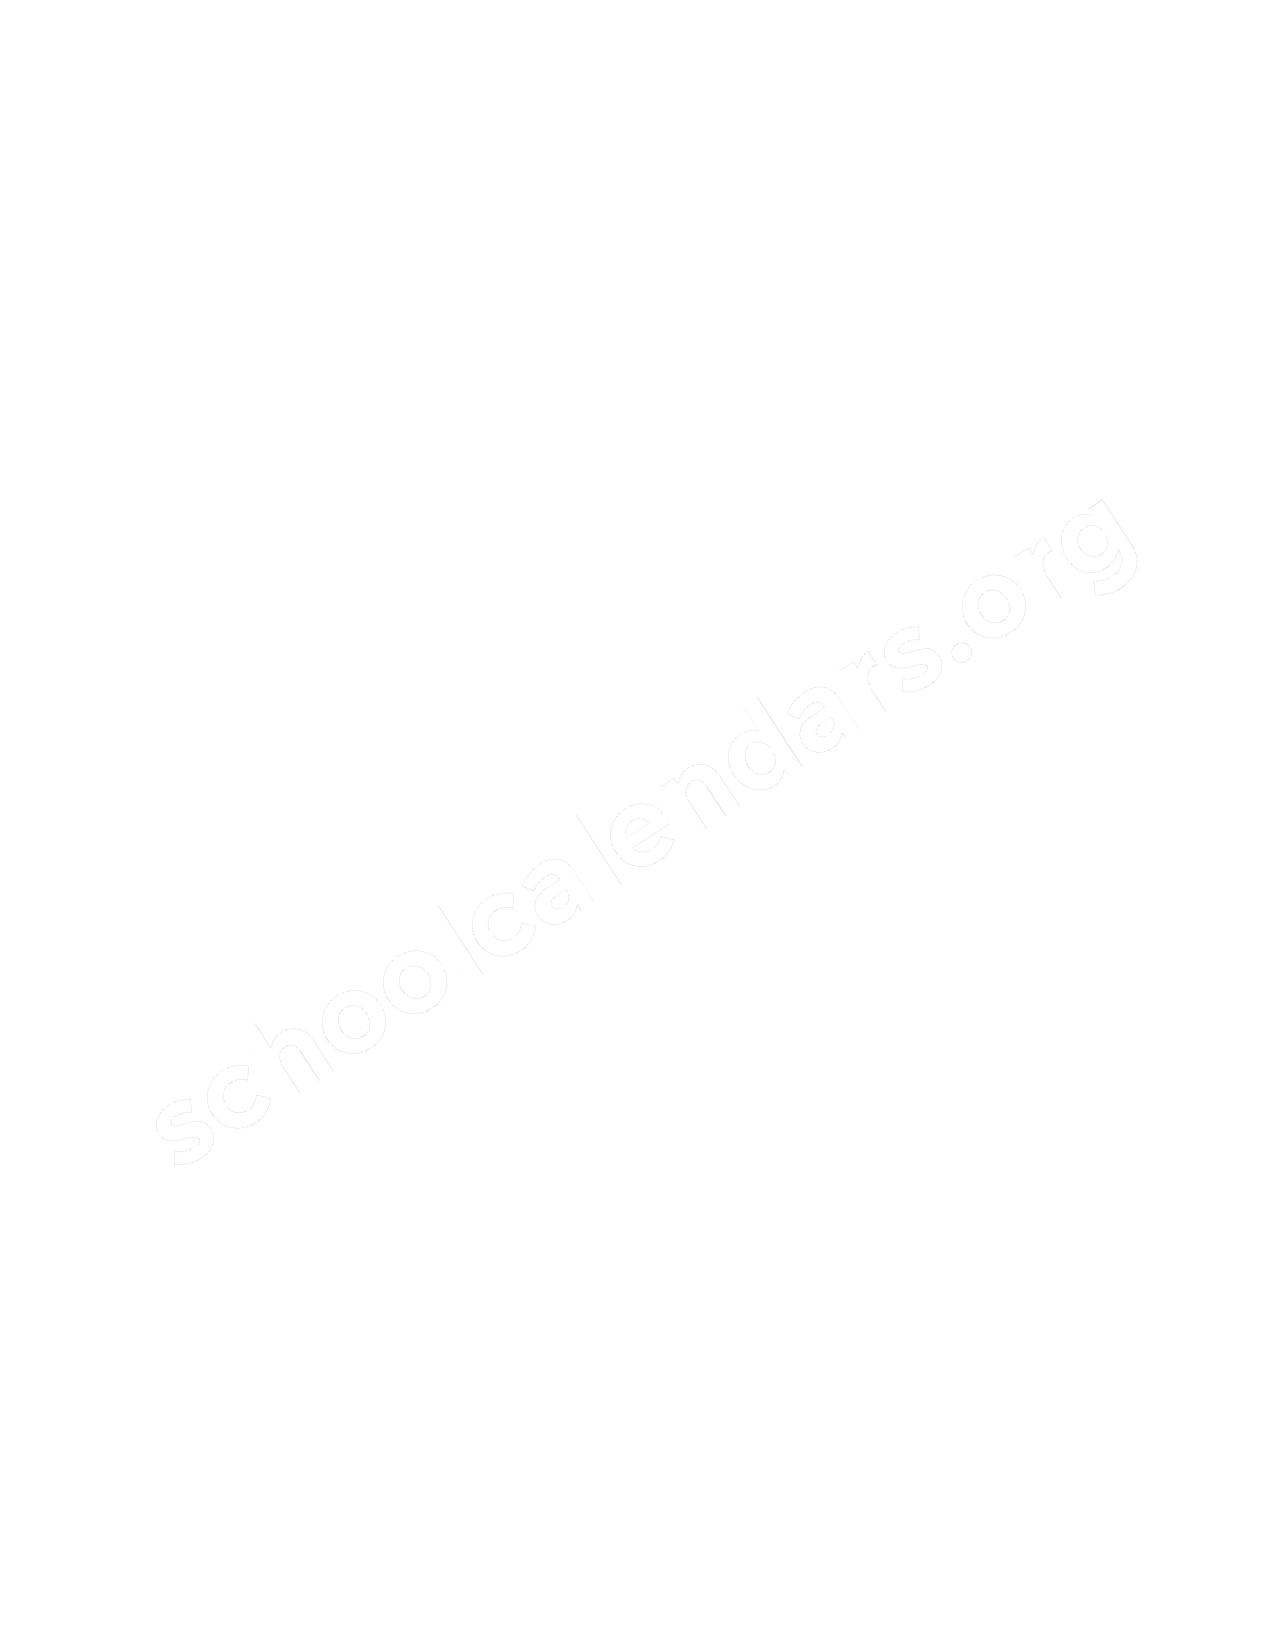 2015 - 2016 District Calendar – Stoner Prairie Elementary School – page 3